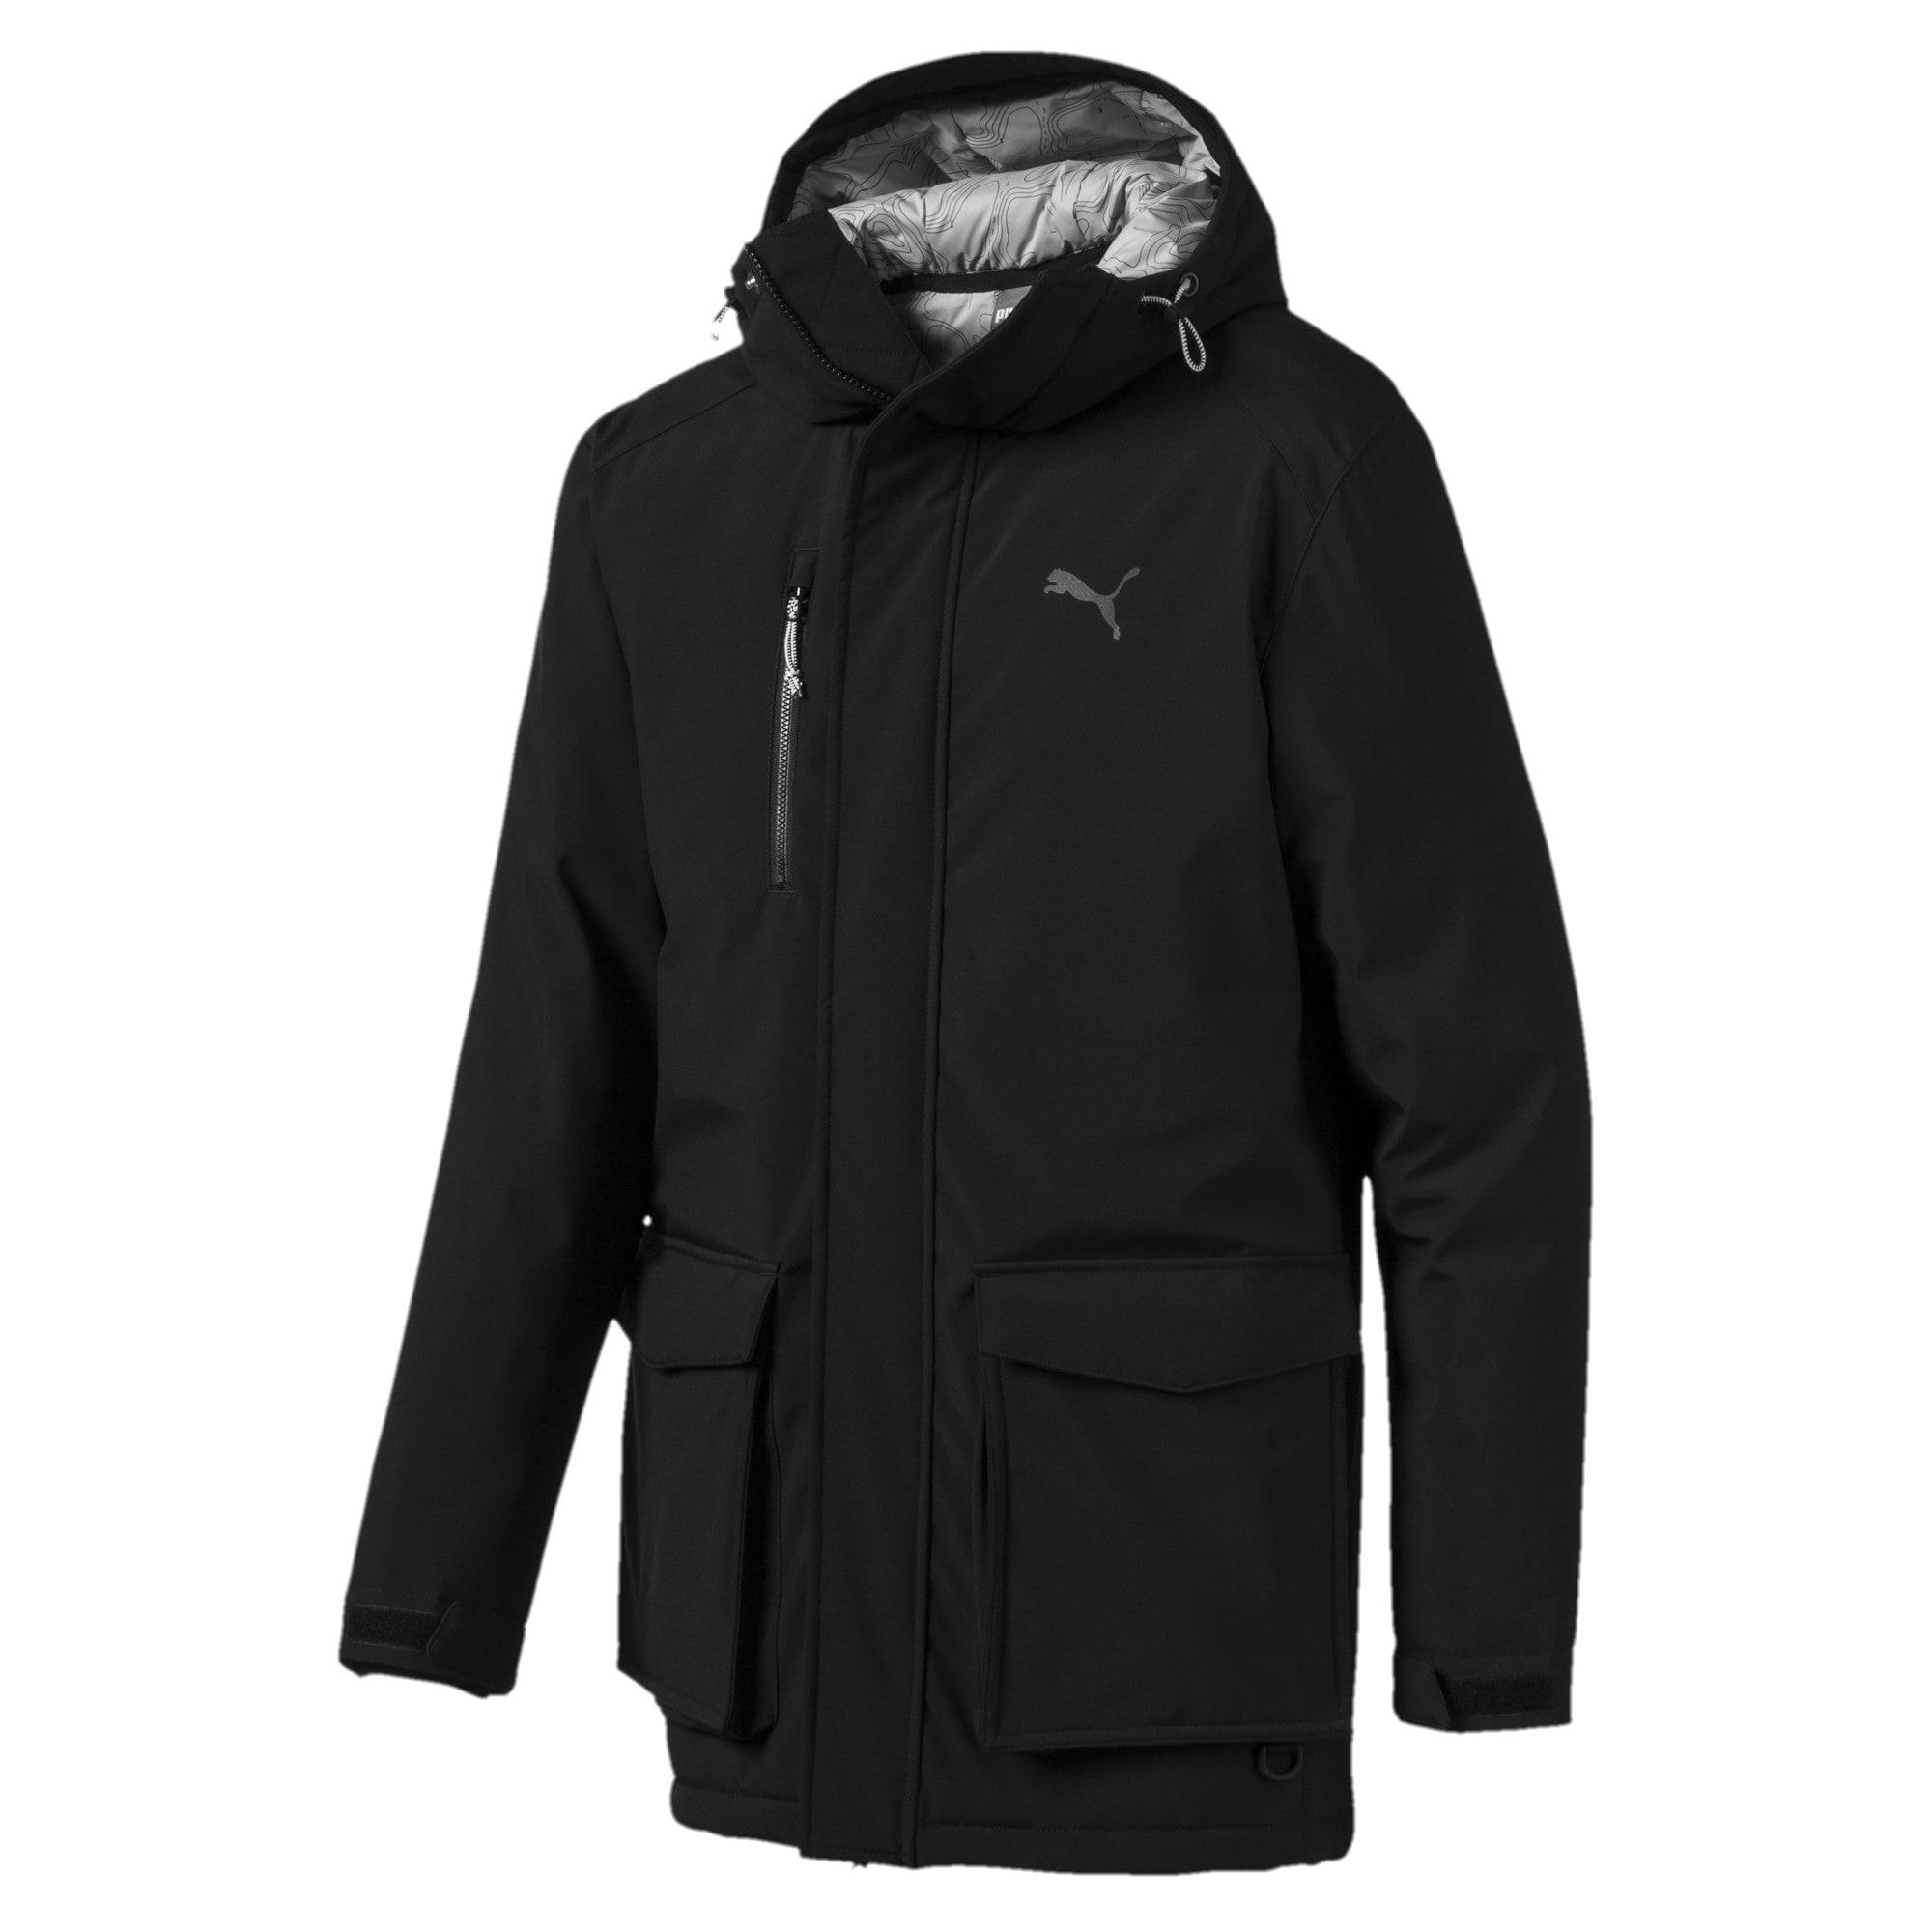 Thumbnail 1 of Epoch Storm Men's Down Jacket, Puma Black, medium